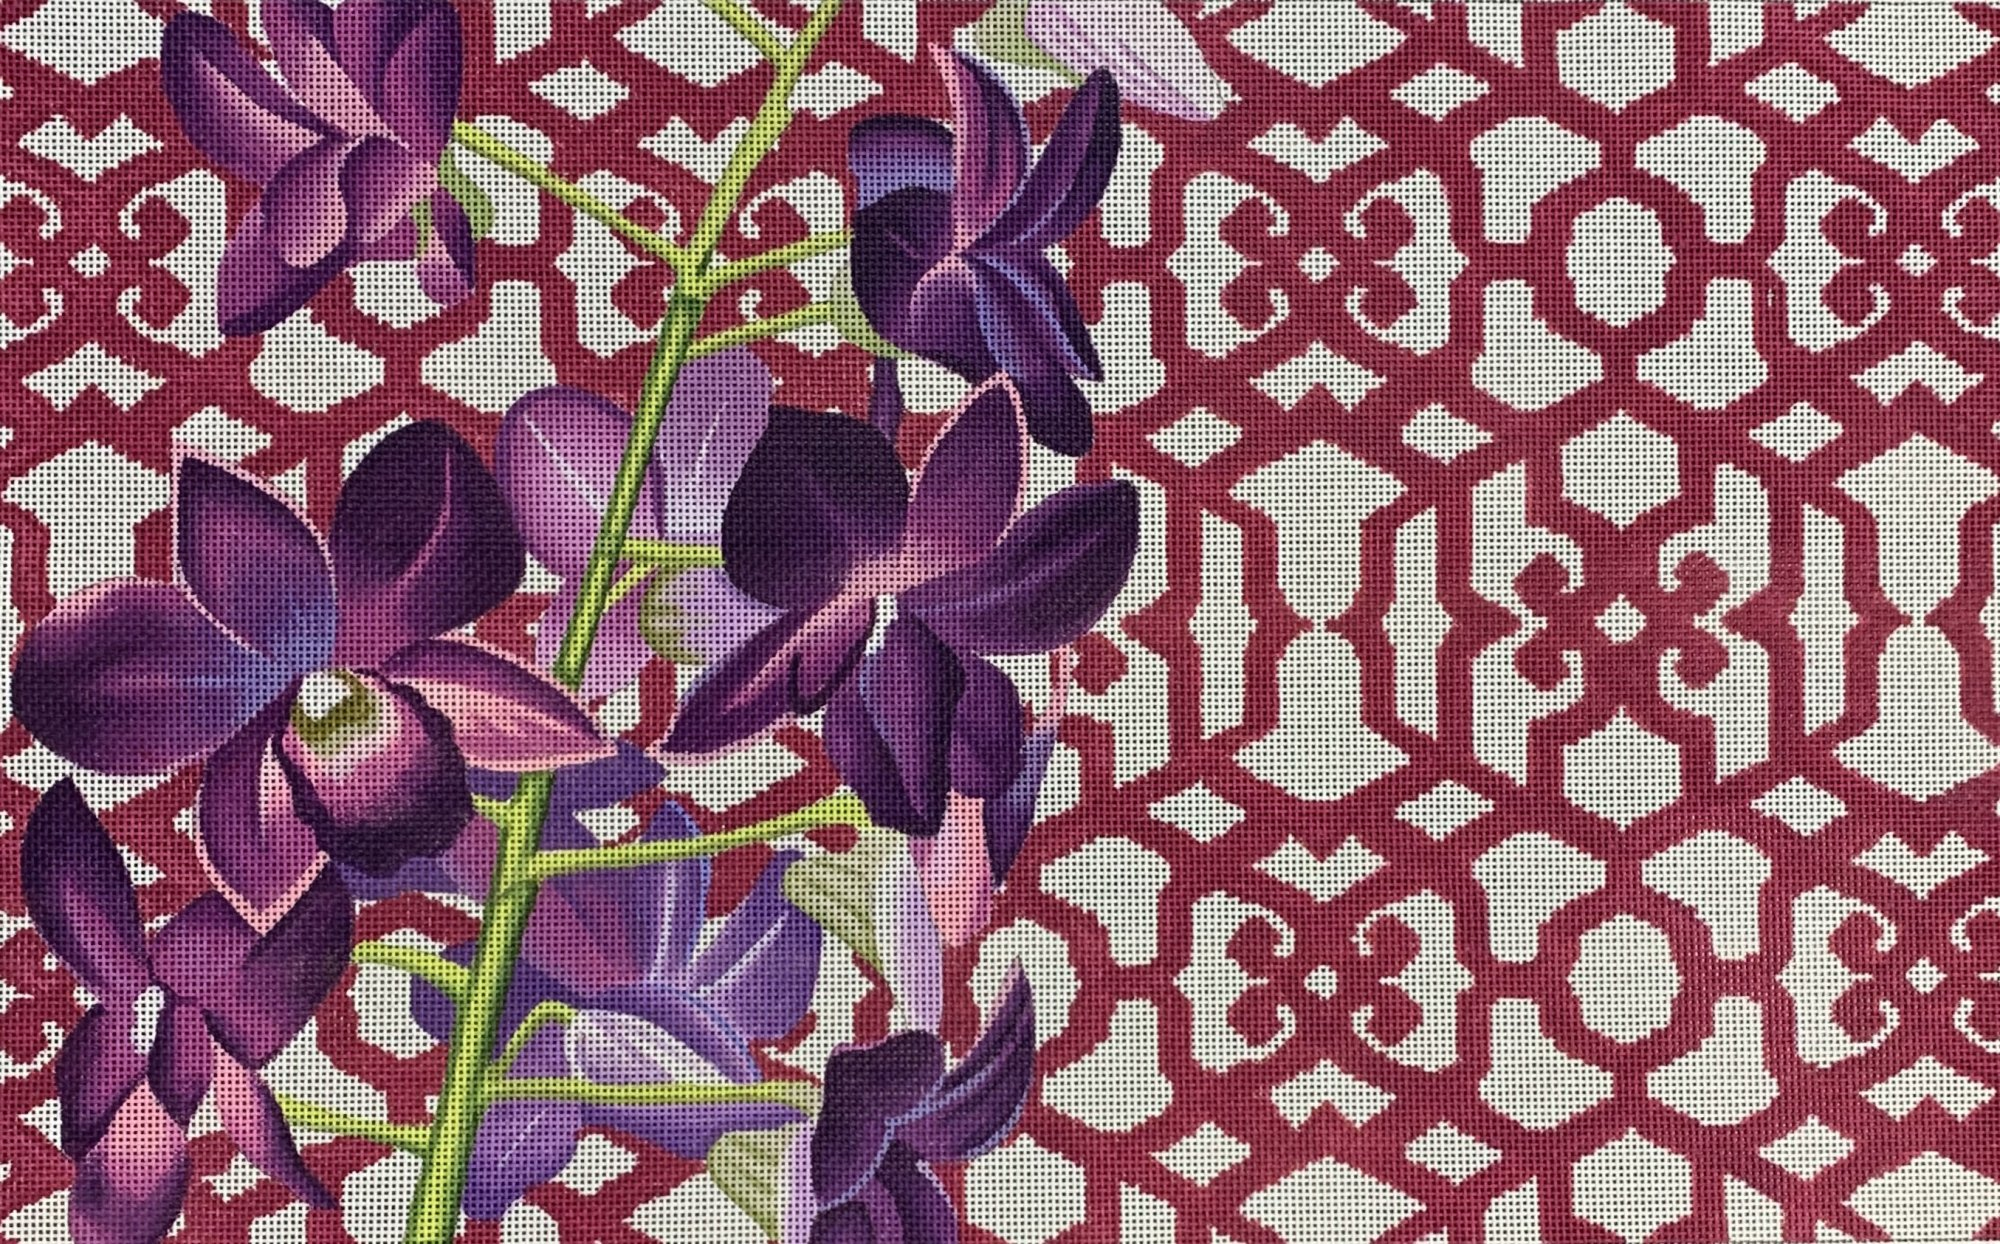 Orchid/Trellis